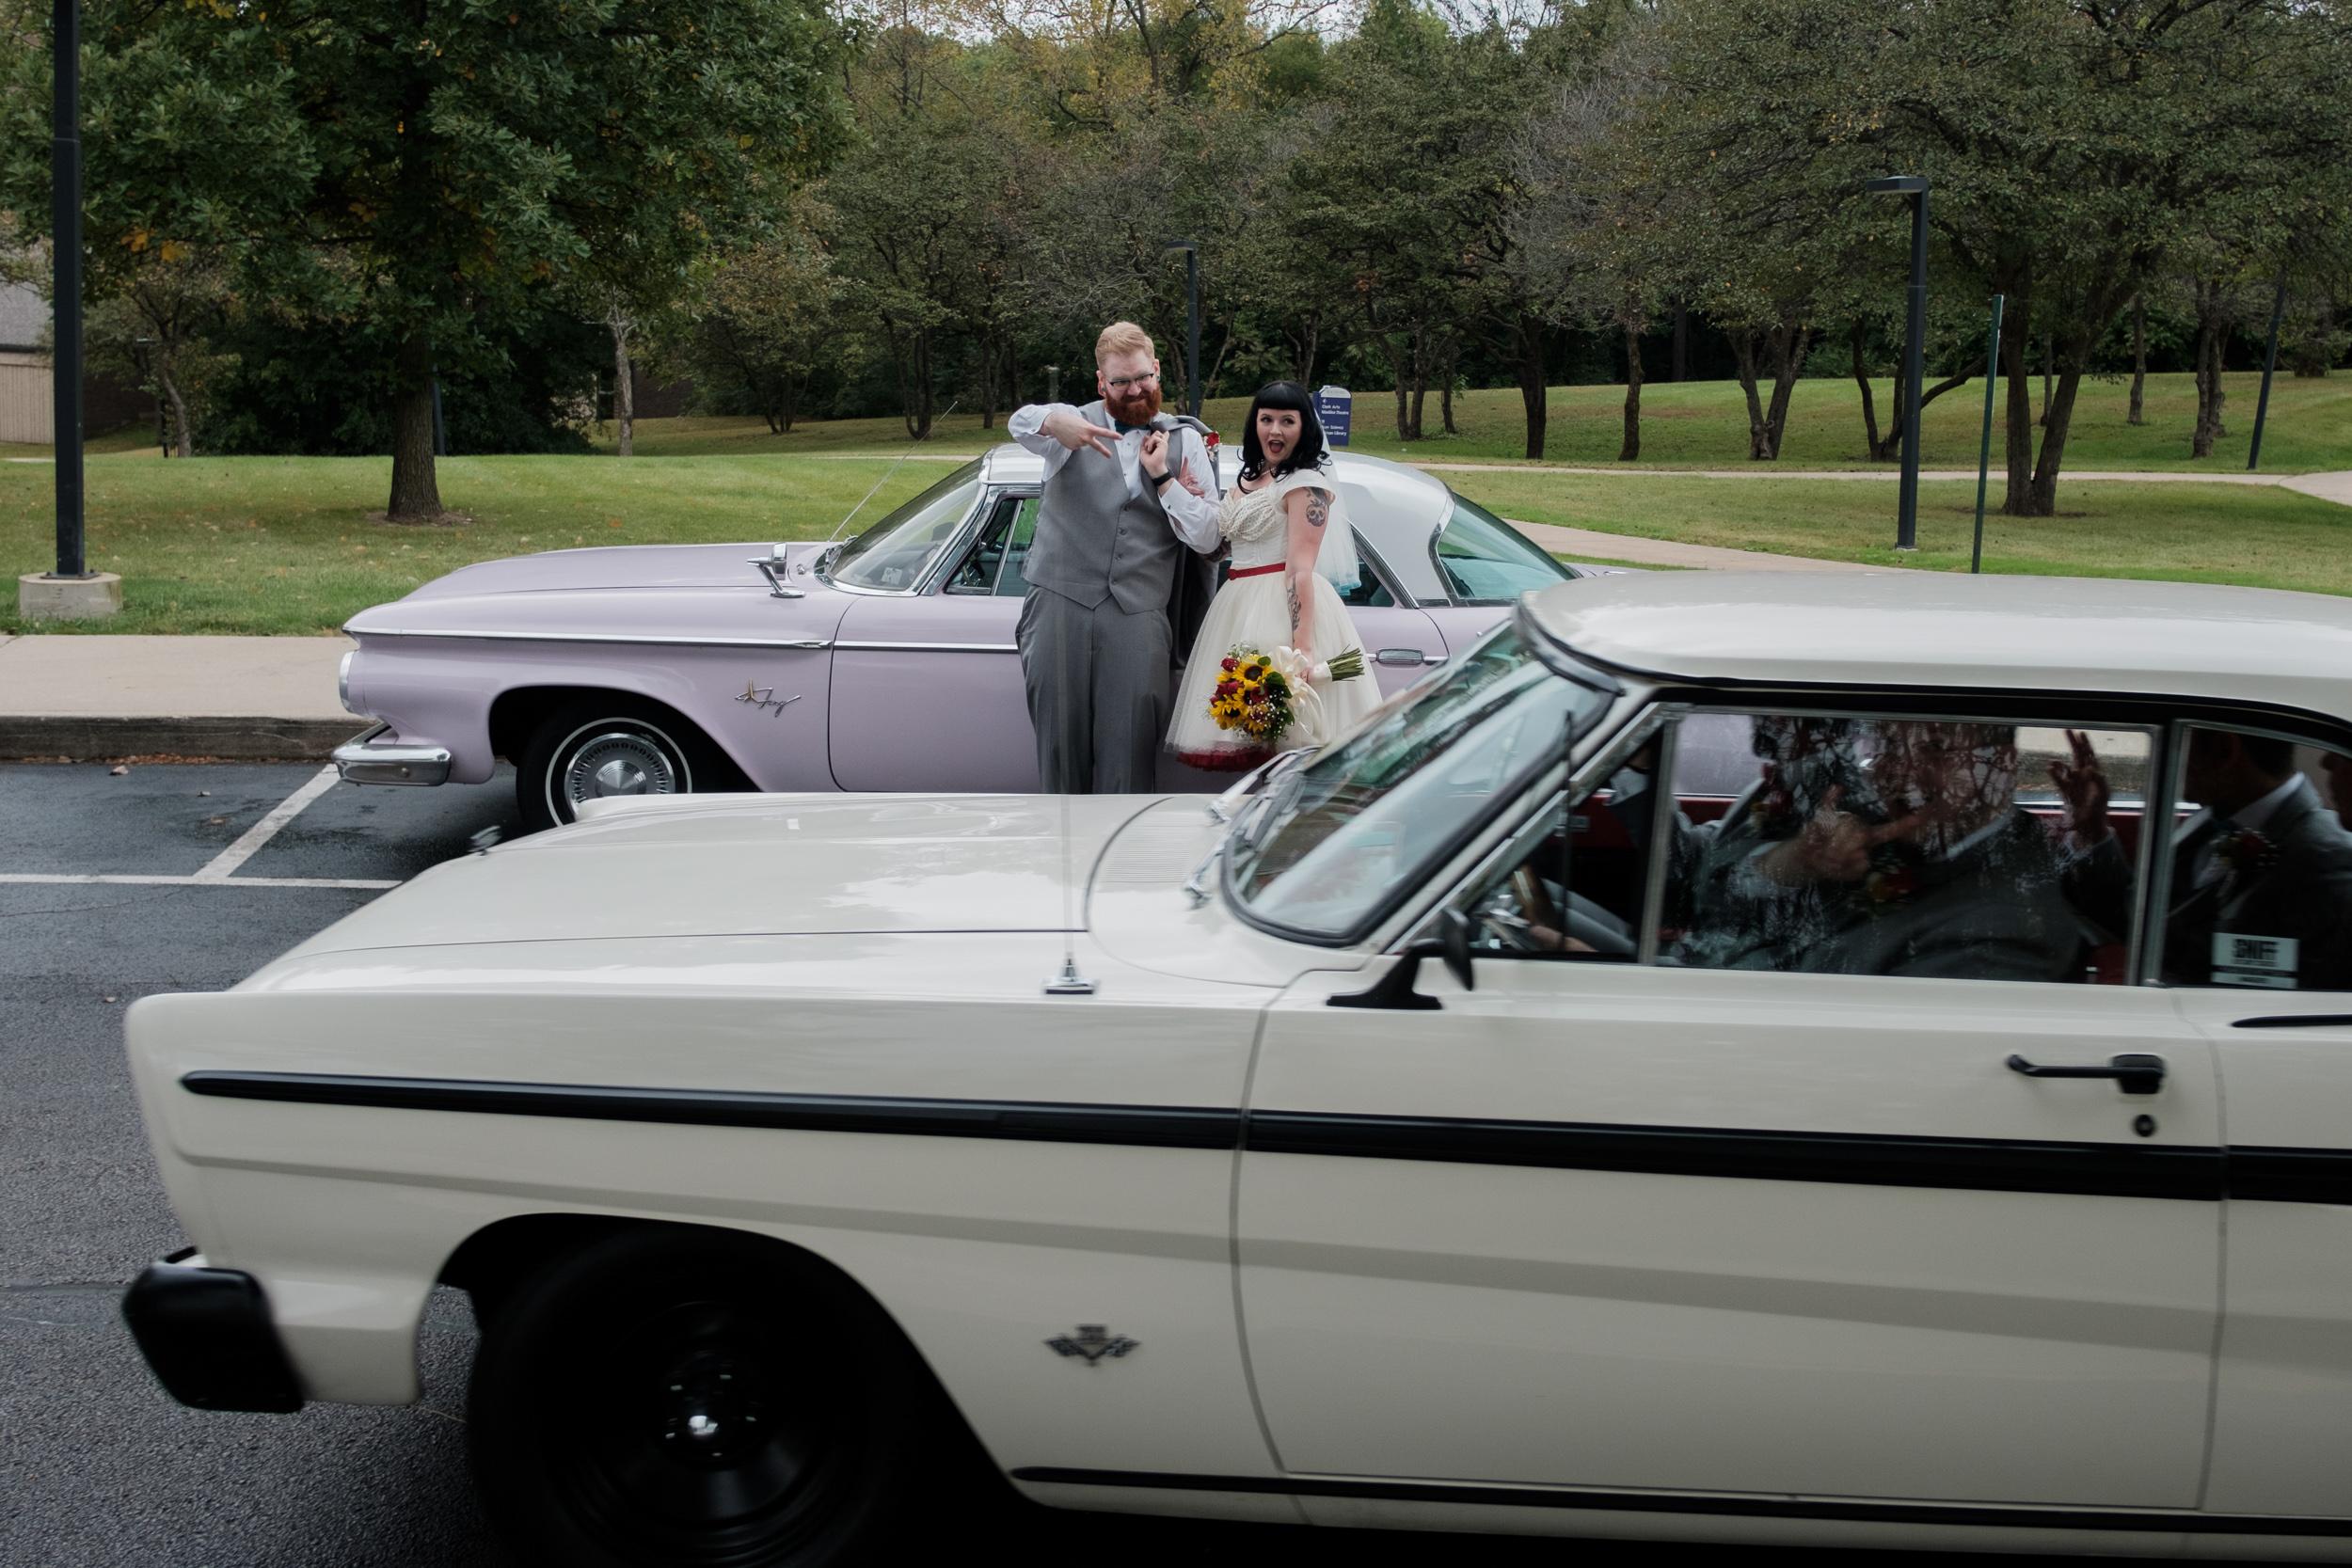 Christian & Sarah wedding photography by Brian milo-178.jpg